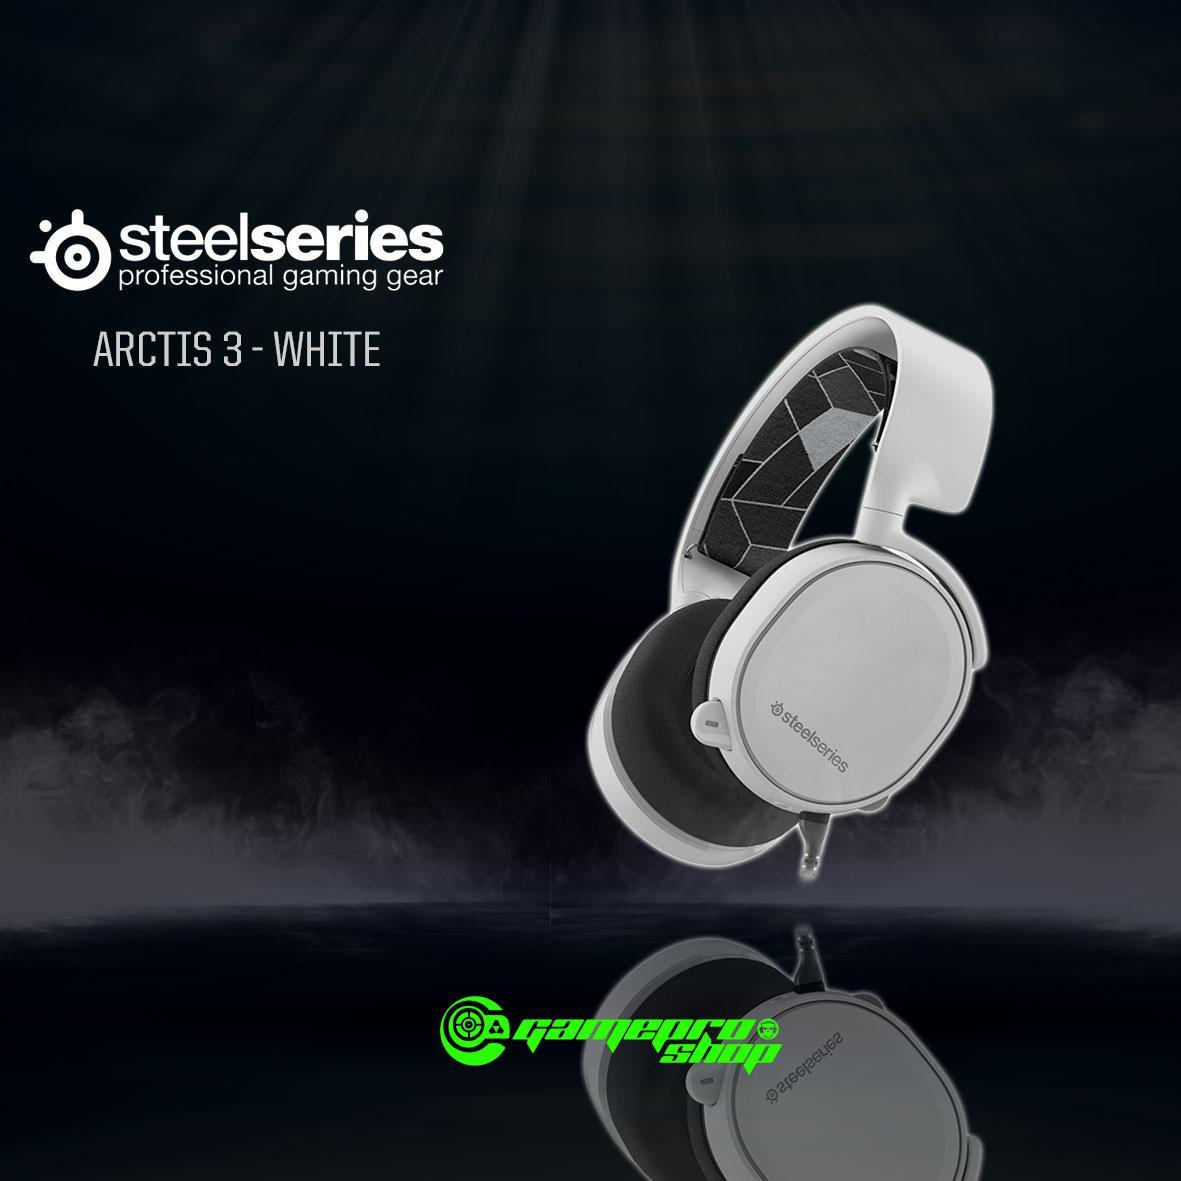 Retail Price Steelseries Arctis 3 Headphone White Colour Gss Promo